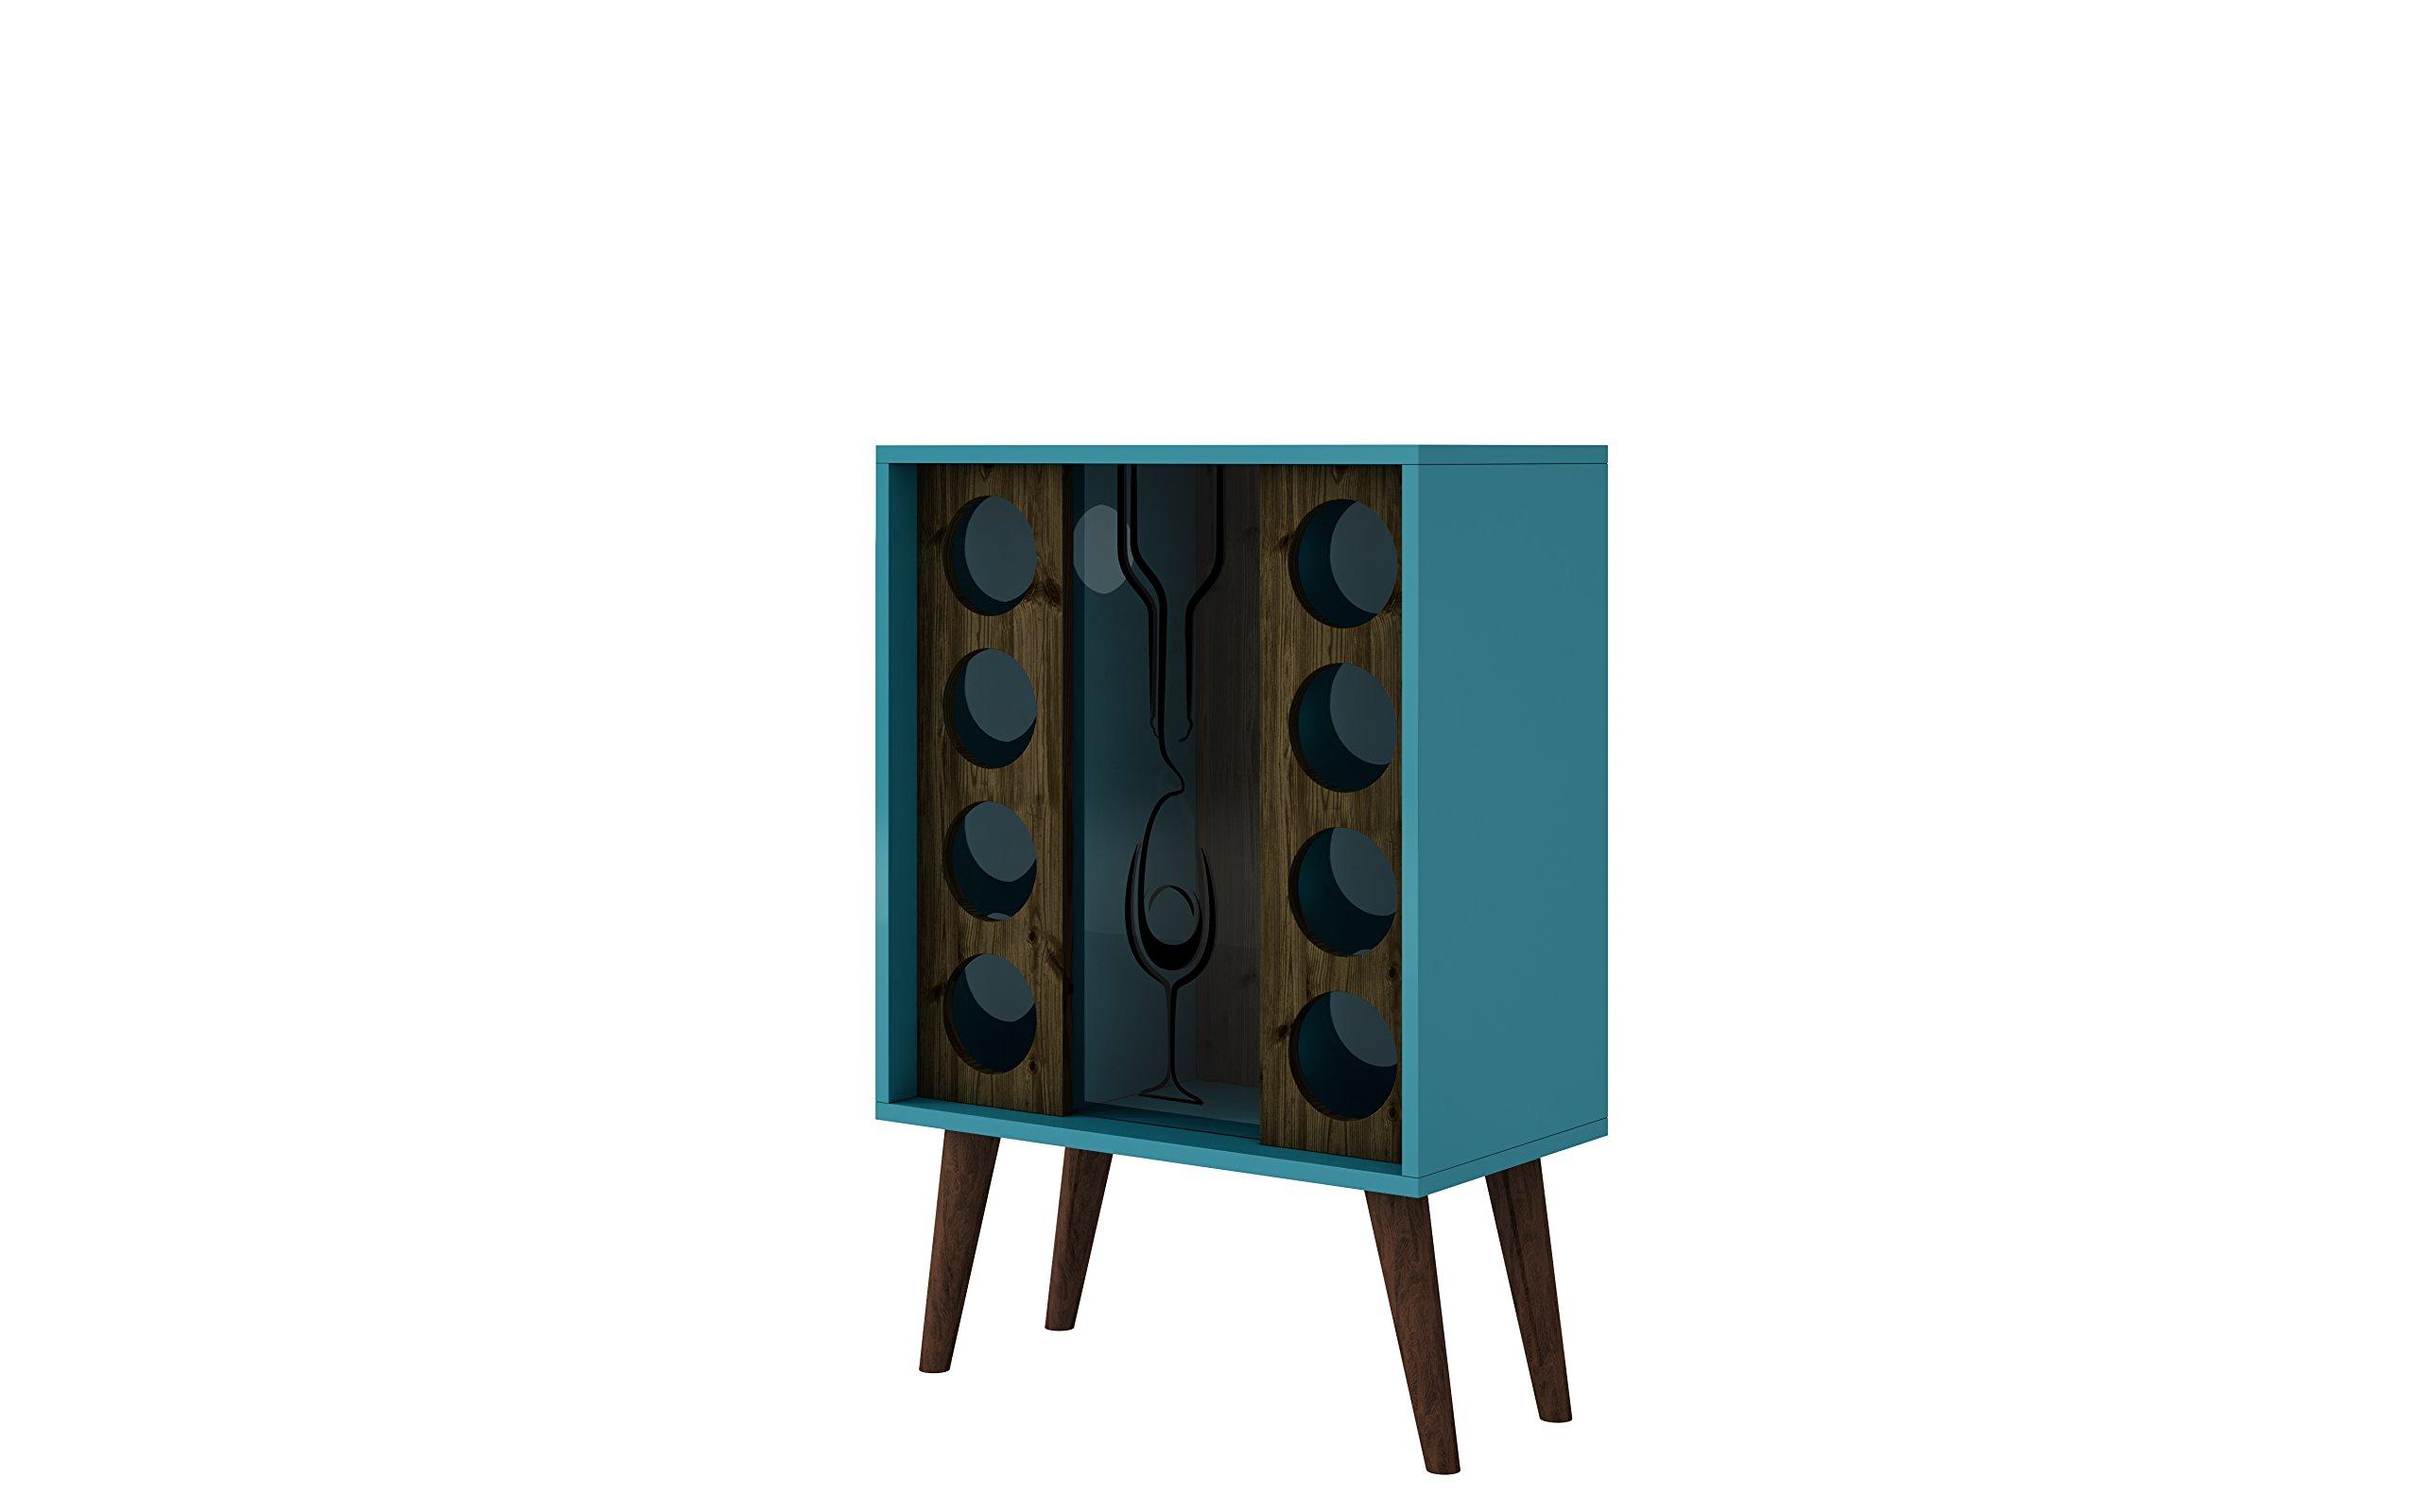 Manhattan Comfort Lund Collection Modern Square Design Reclaimed Wine Bar Cabinet, Holds 8 Bottles, Teal/Wood by Manhattan Comfort